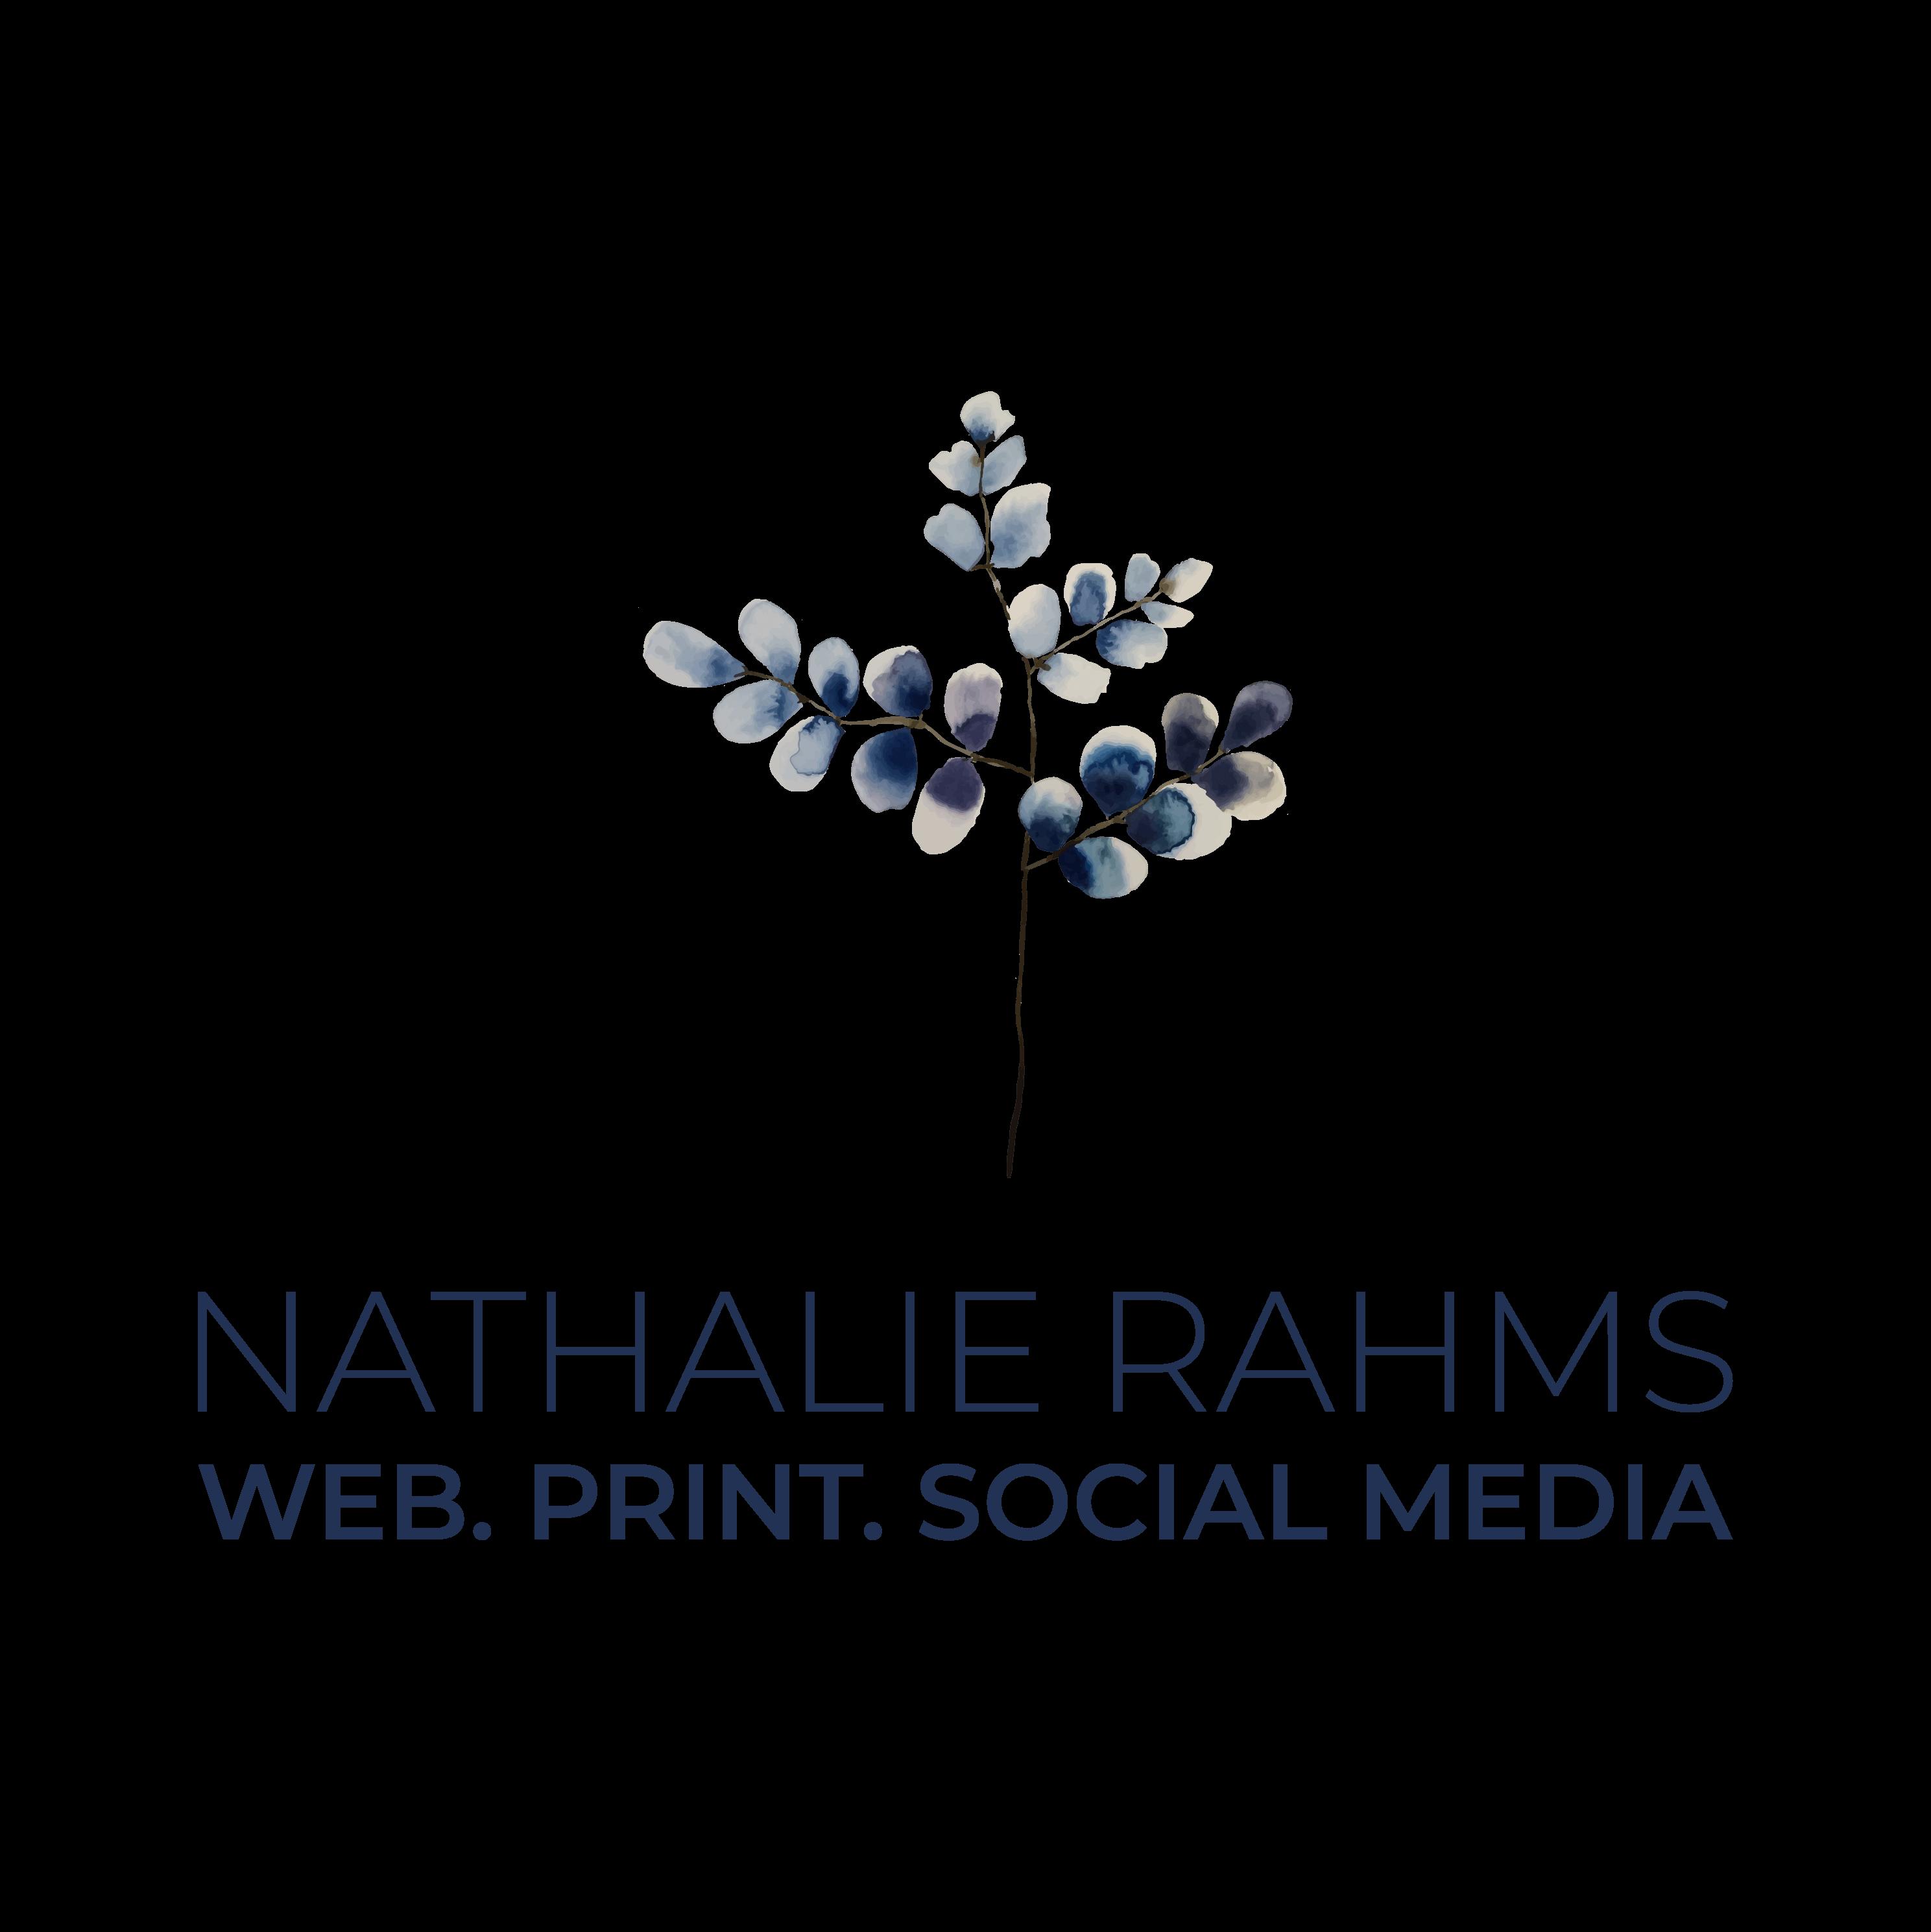 Nathalie Rahms | Grafikdesign |Webdesign